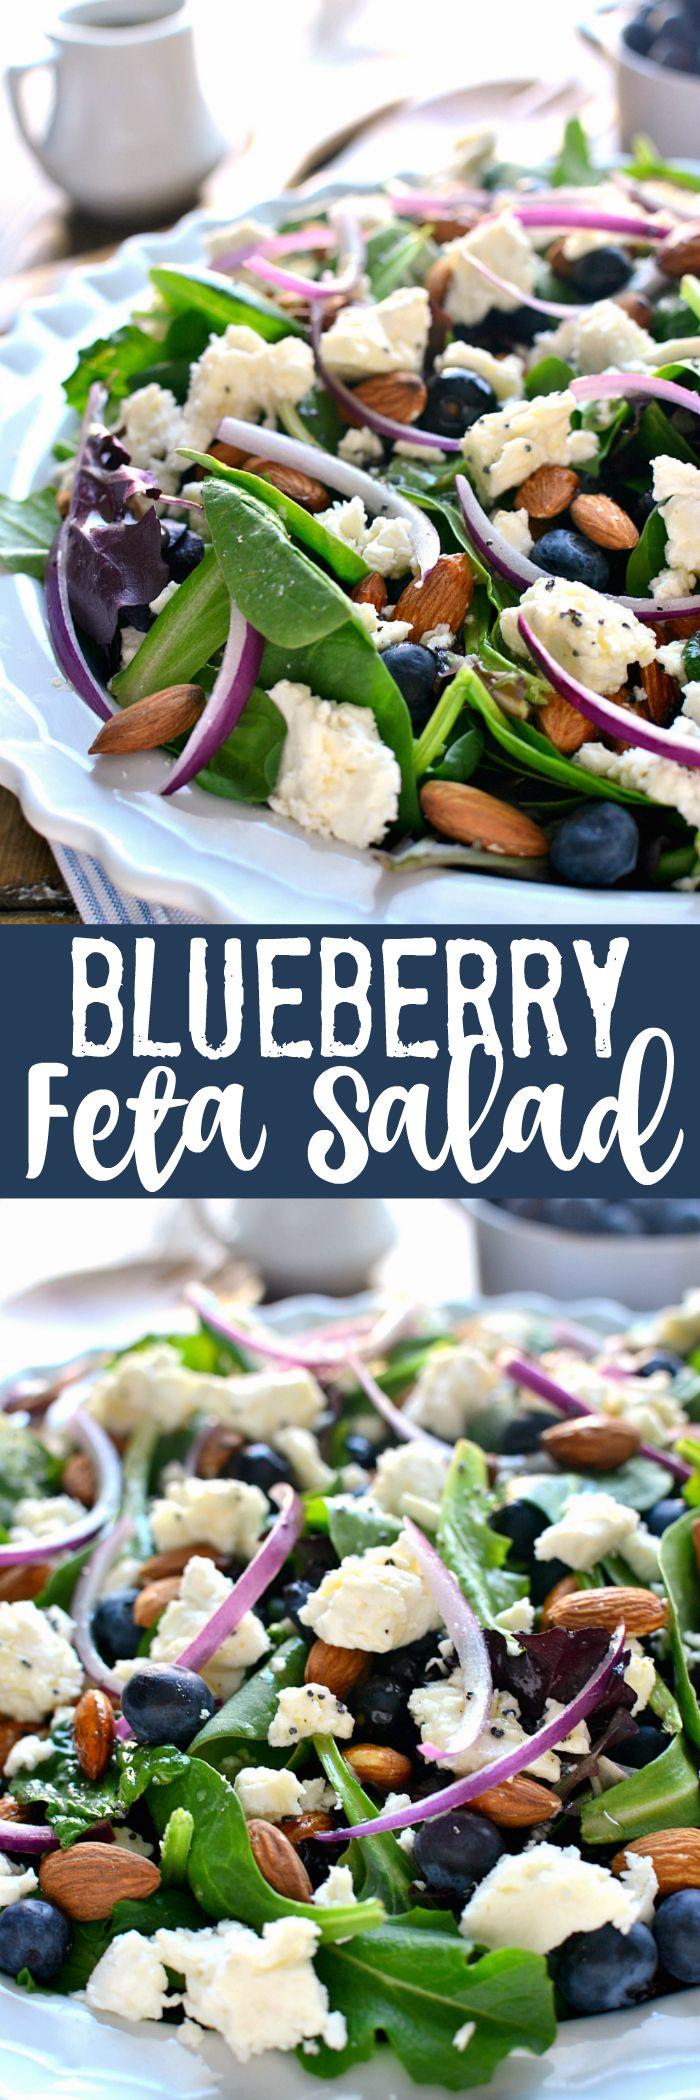 #SaladSunday